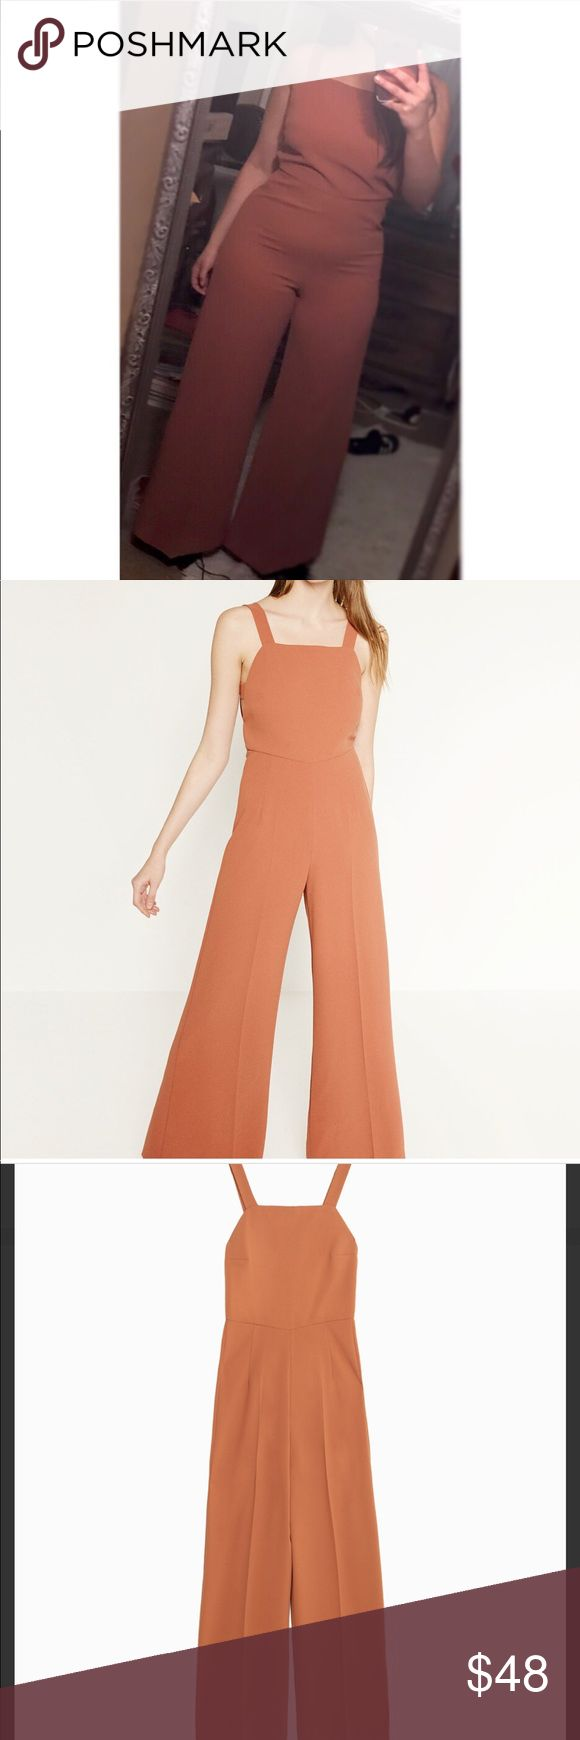 Zara jumpsuit Coral Zara jumpsuit with bell bottoms very vintage look Zara Pants Jumpsuits & Rompers